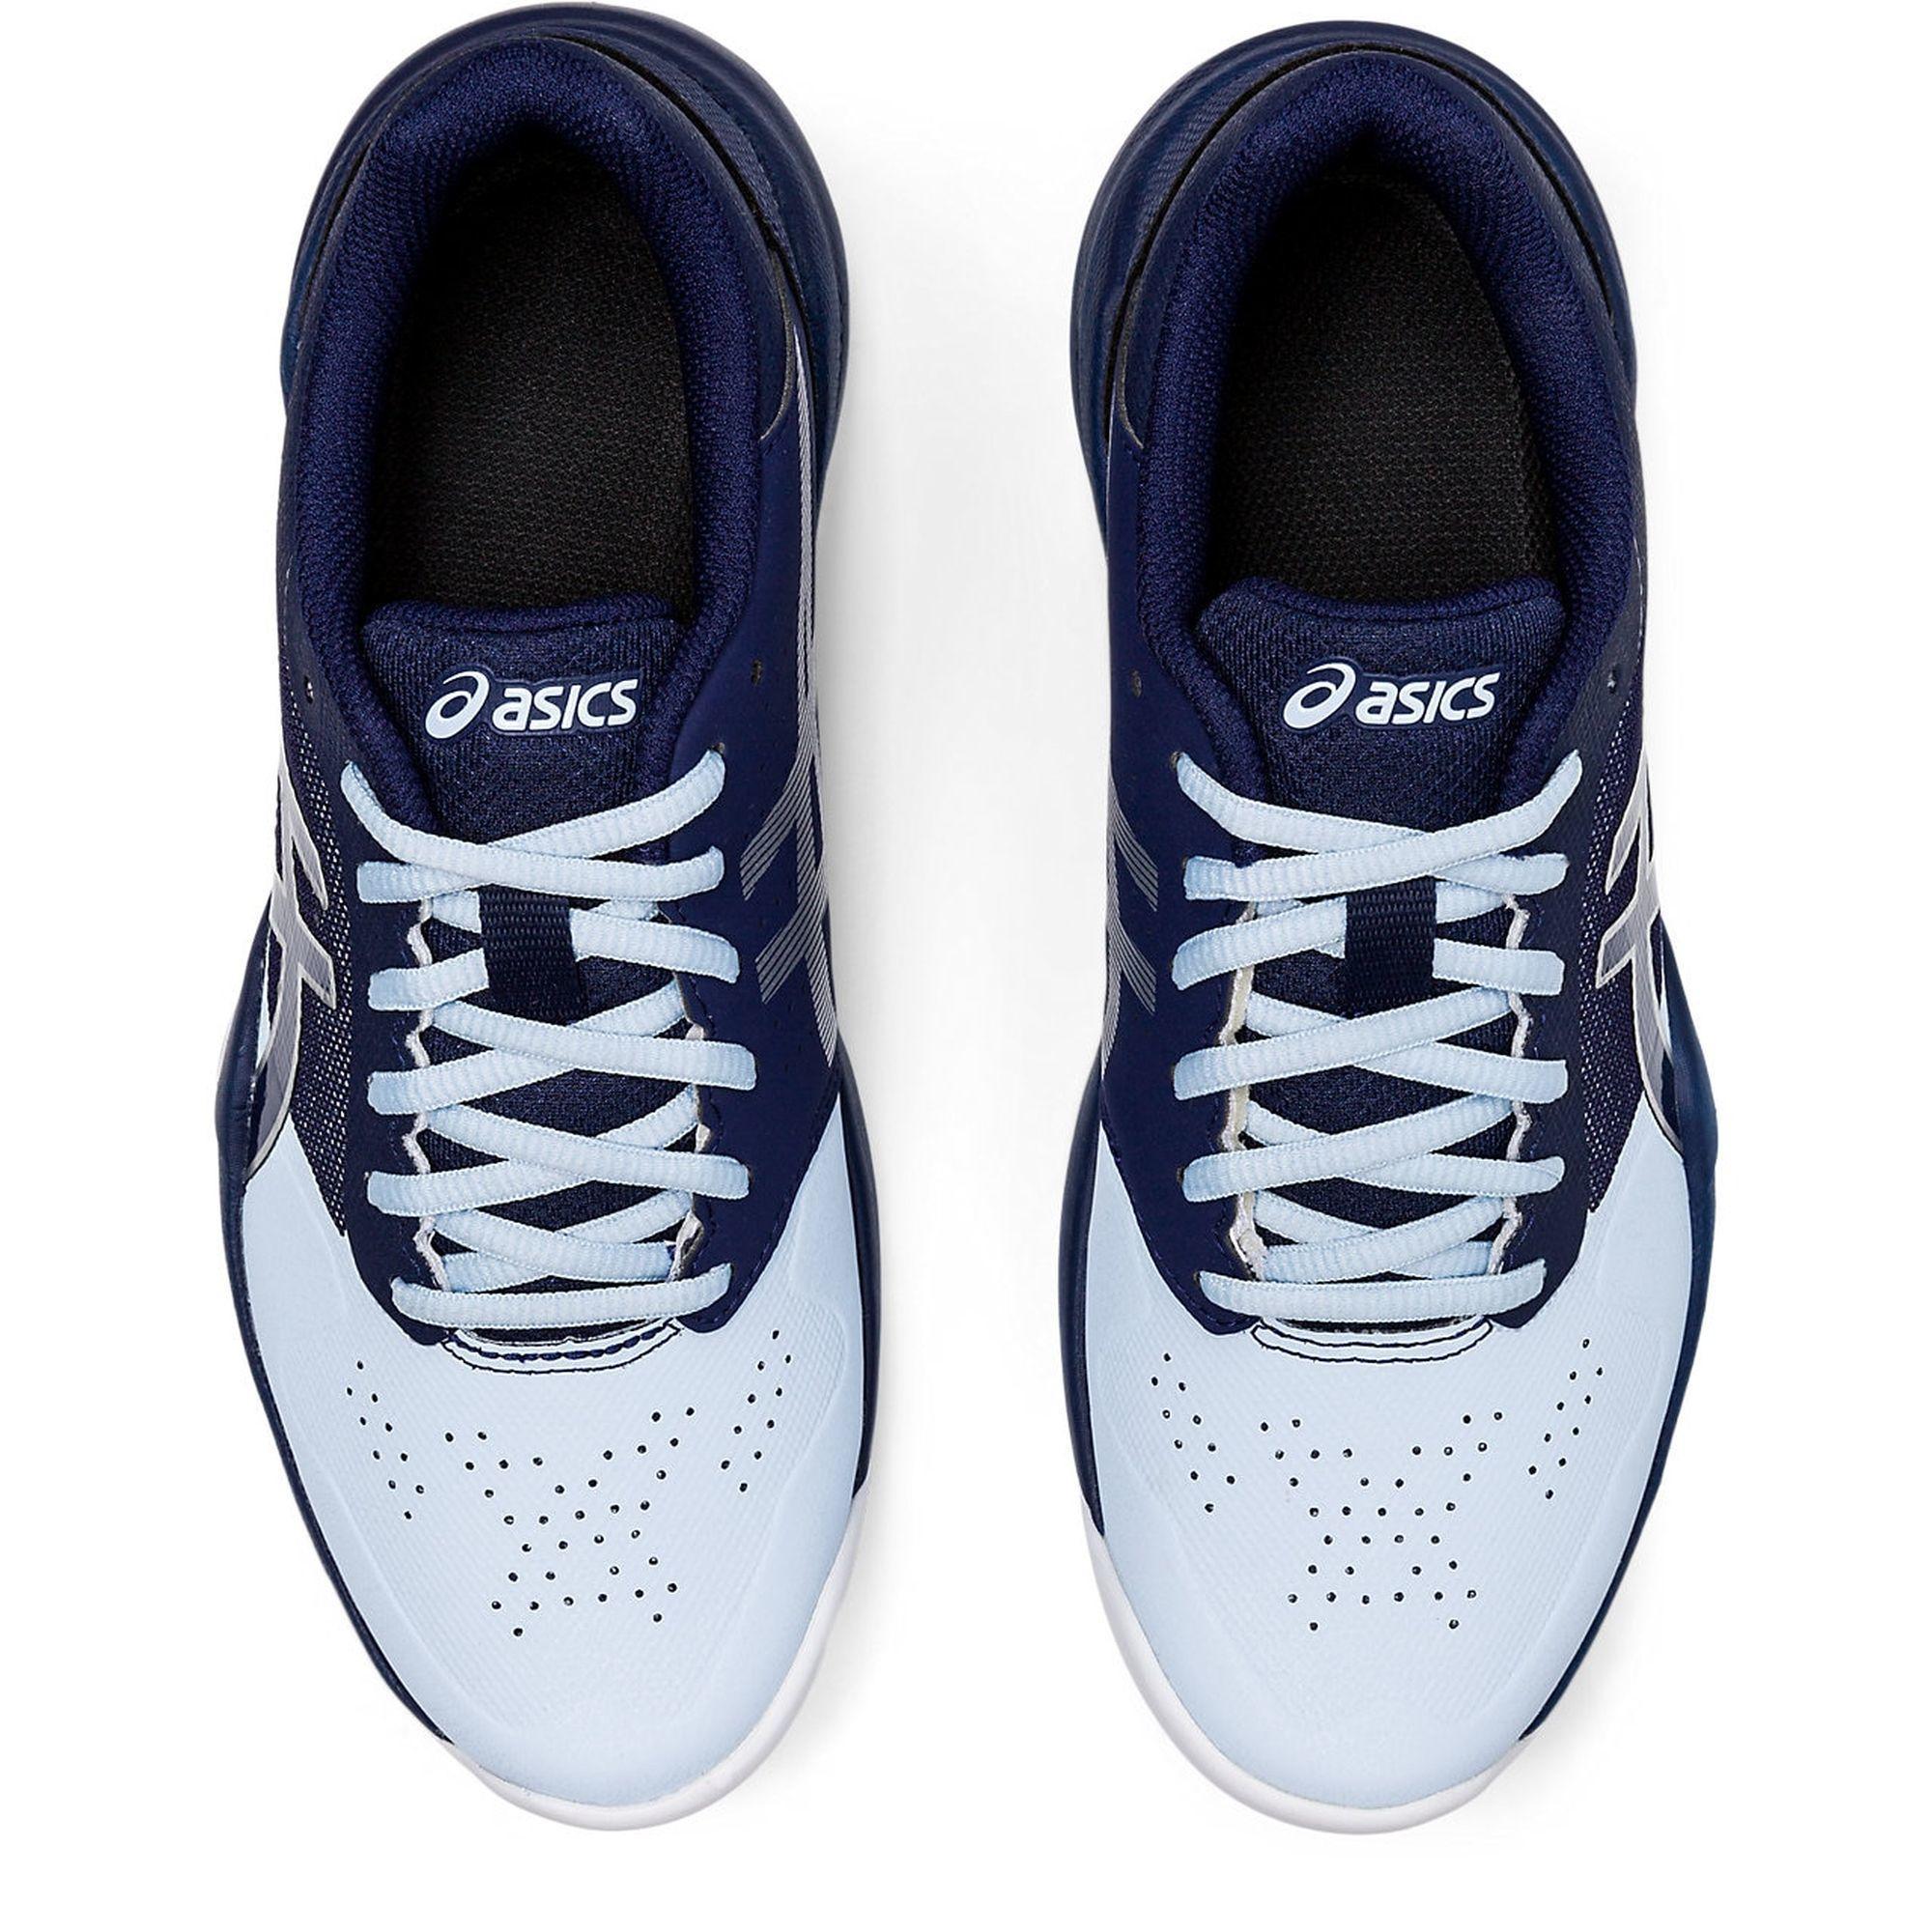 asics donna scarpe da ginnastica